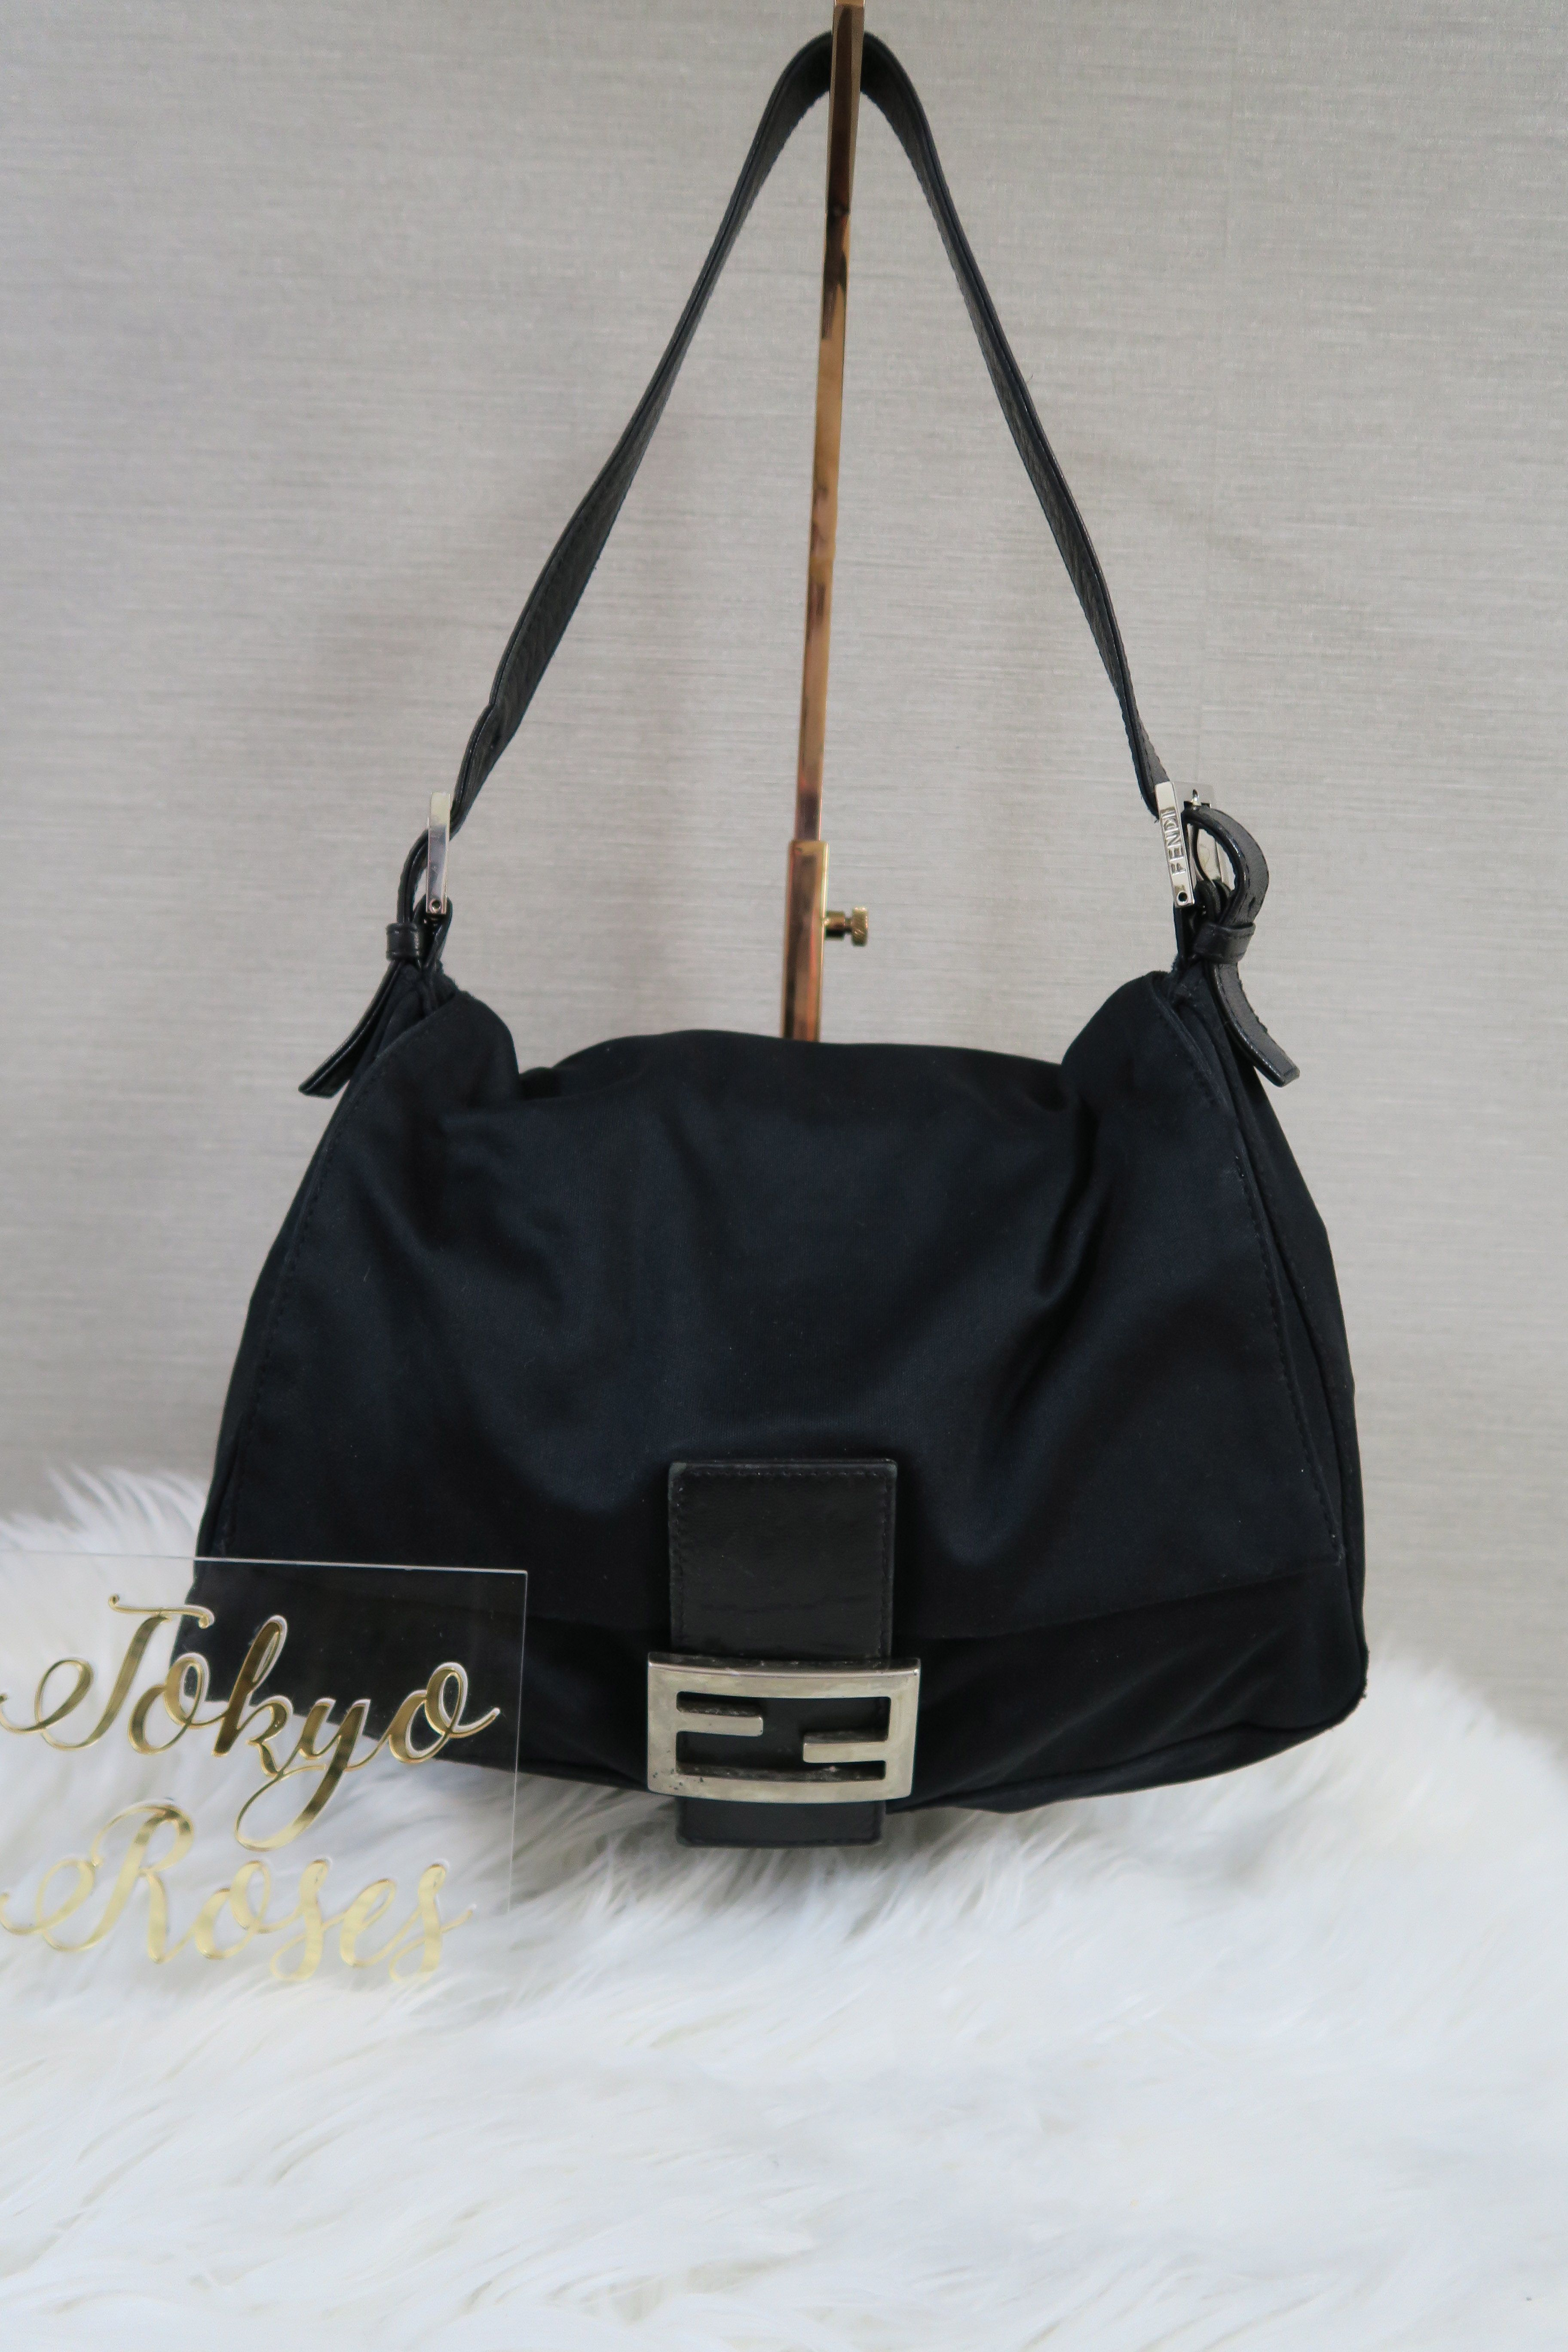 5de78f09d7bd Black Fendi Mama Baguette Handbag L. Find this Pin and more on Vintage  Fendi FF logo Zucca ...